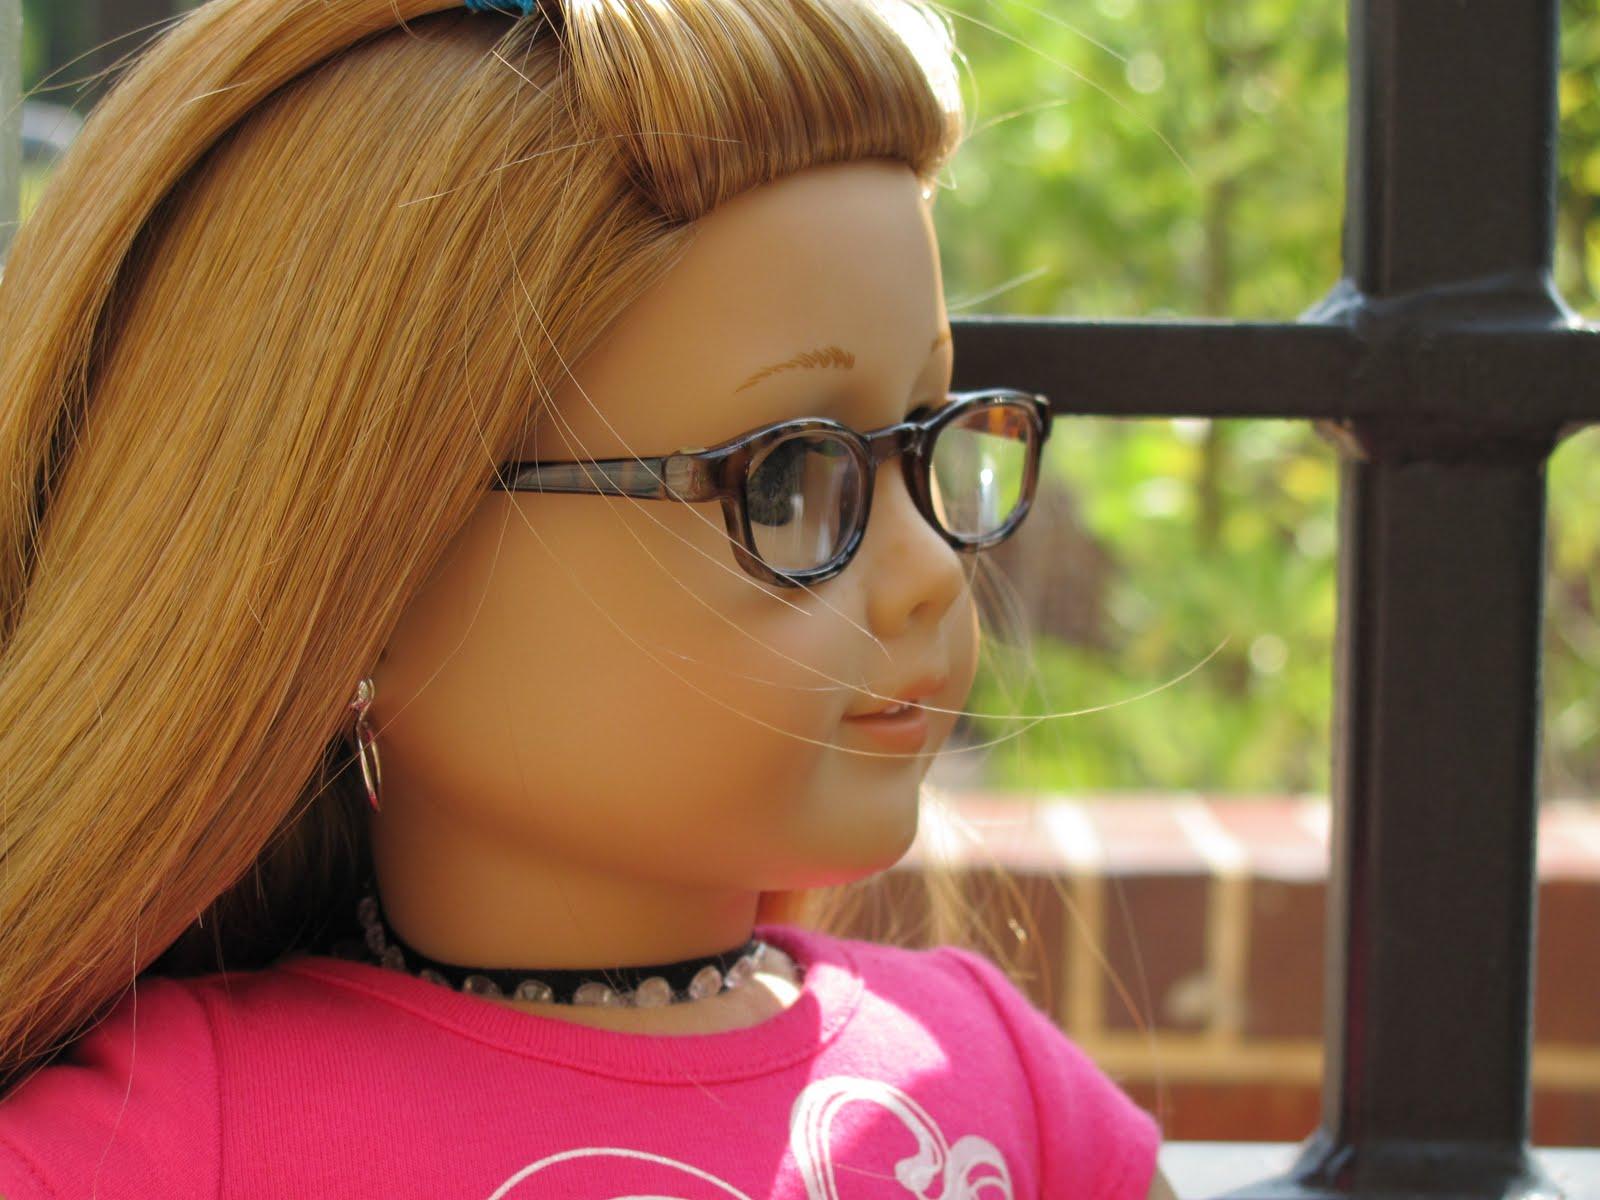 The Doll Focus Studios: ღ My Dolls ღ